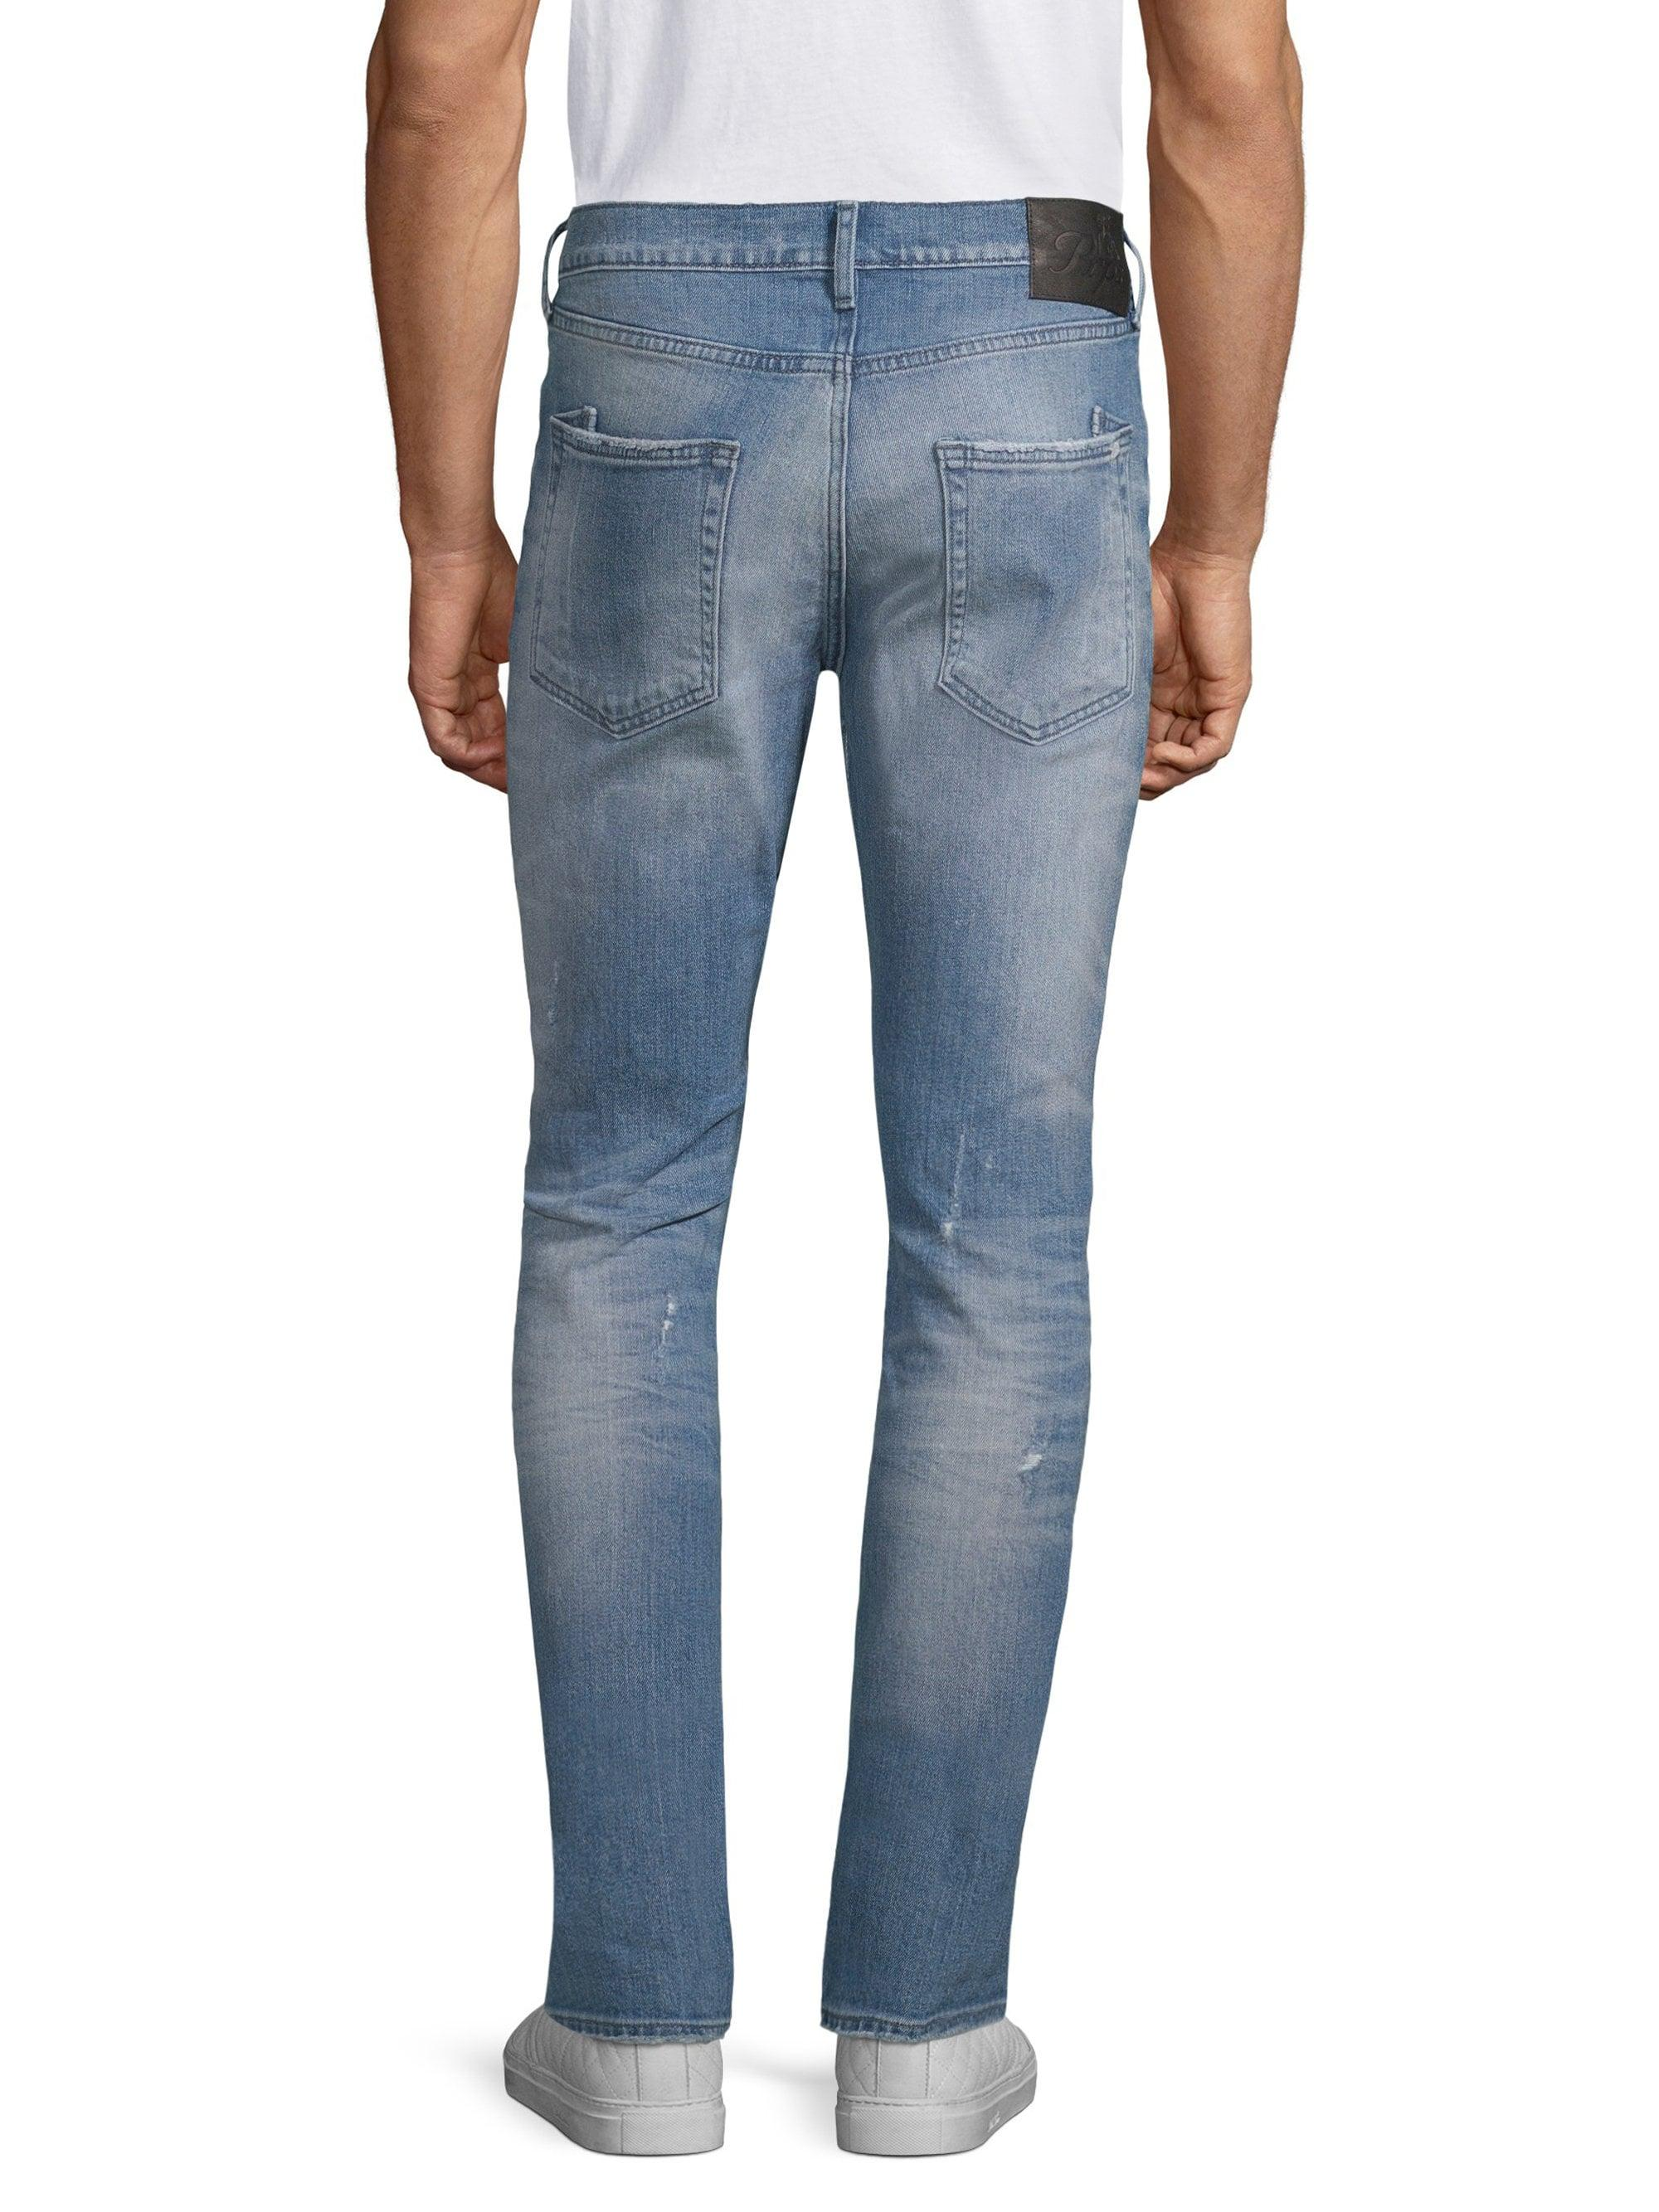 6338a66d9bf Lyst - PRPS Windsor Slim-fit Distressed Jeans in Blue for Men